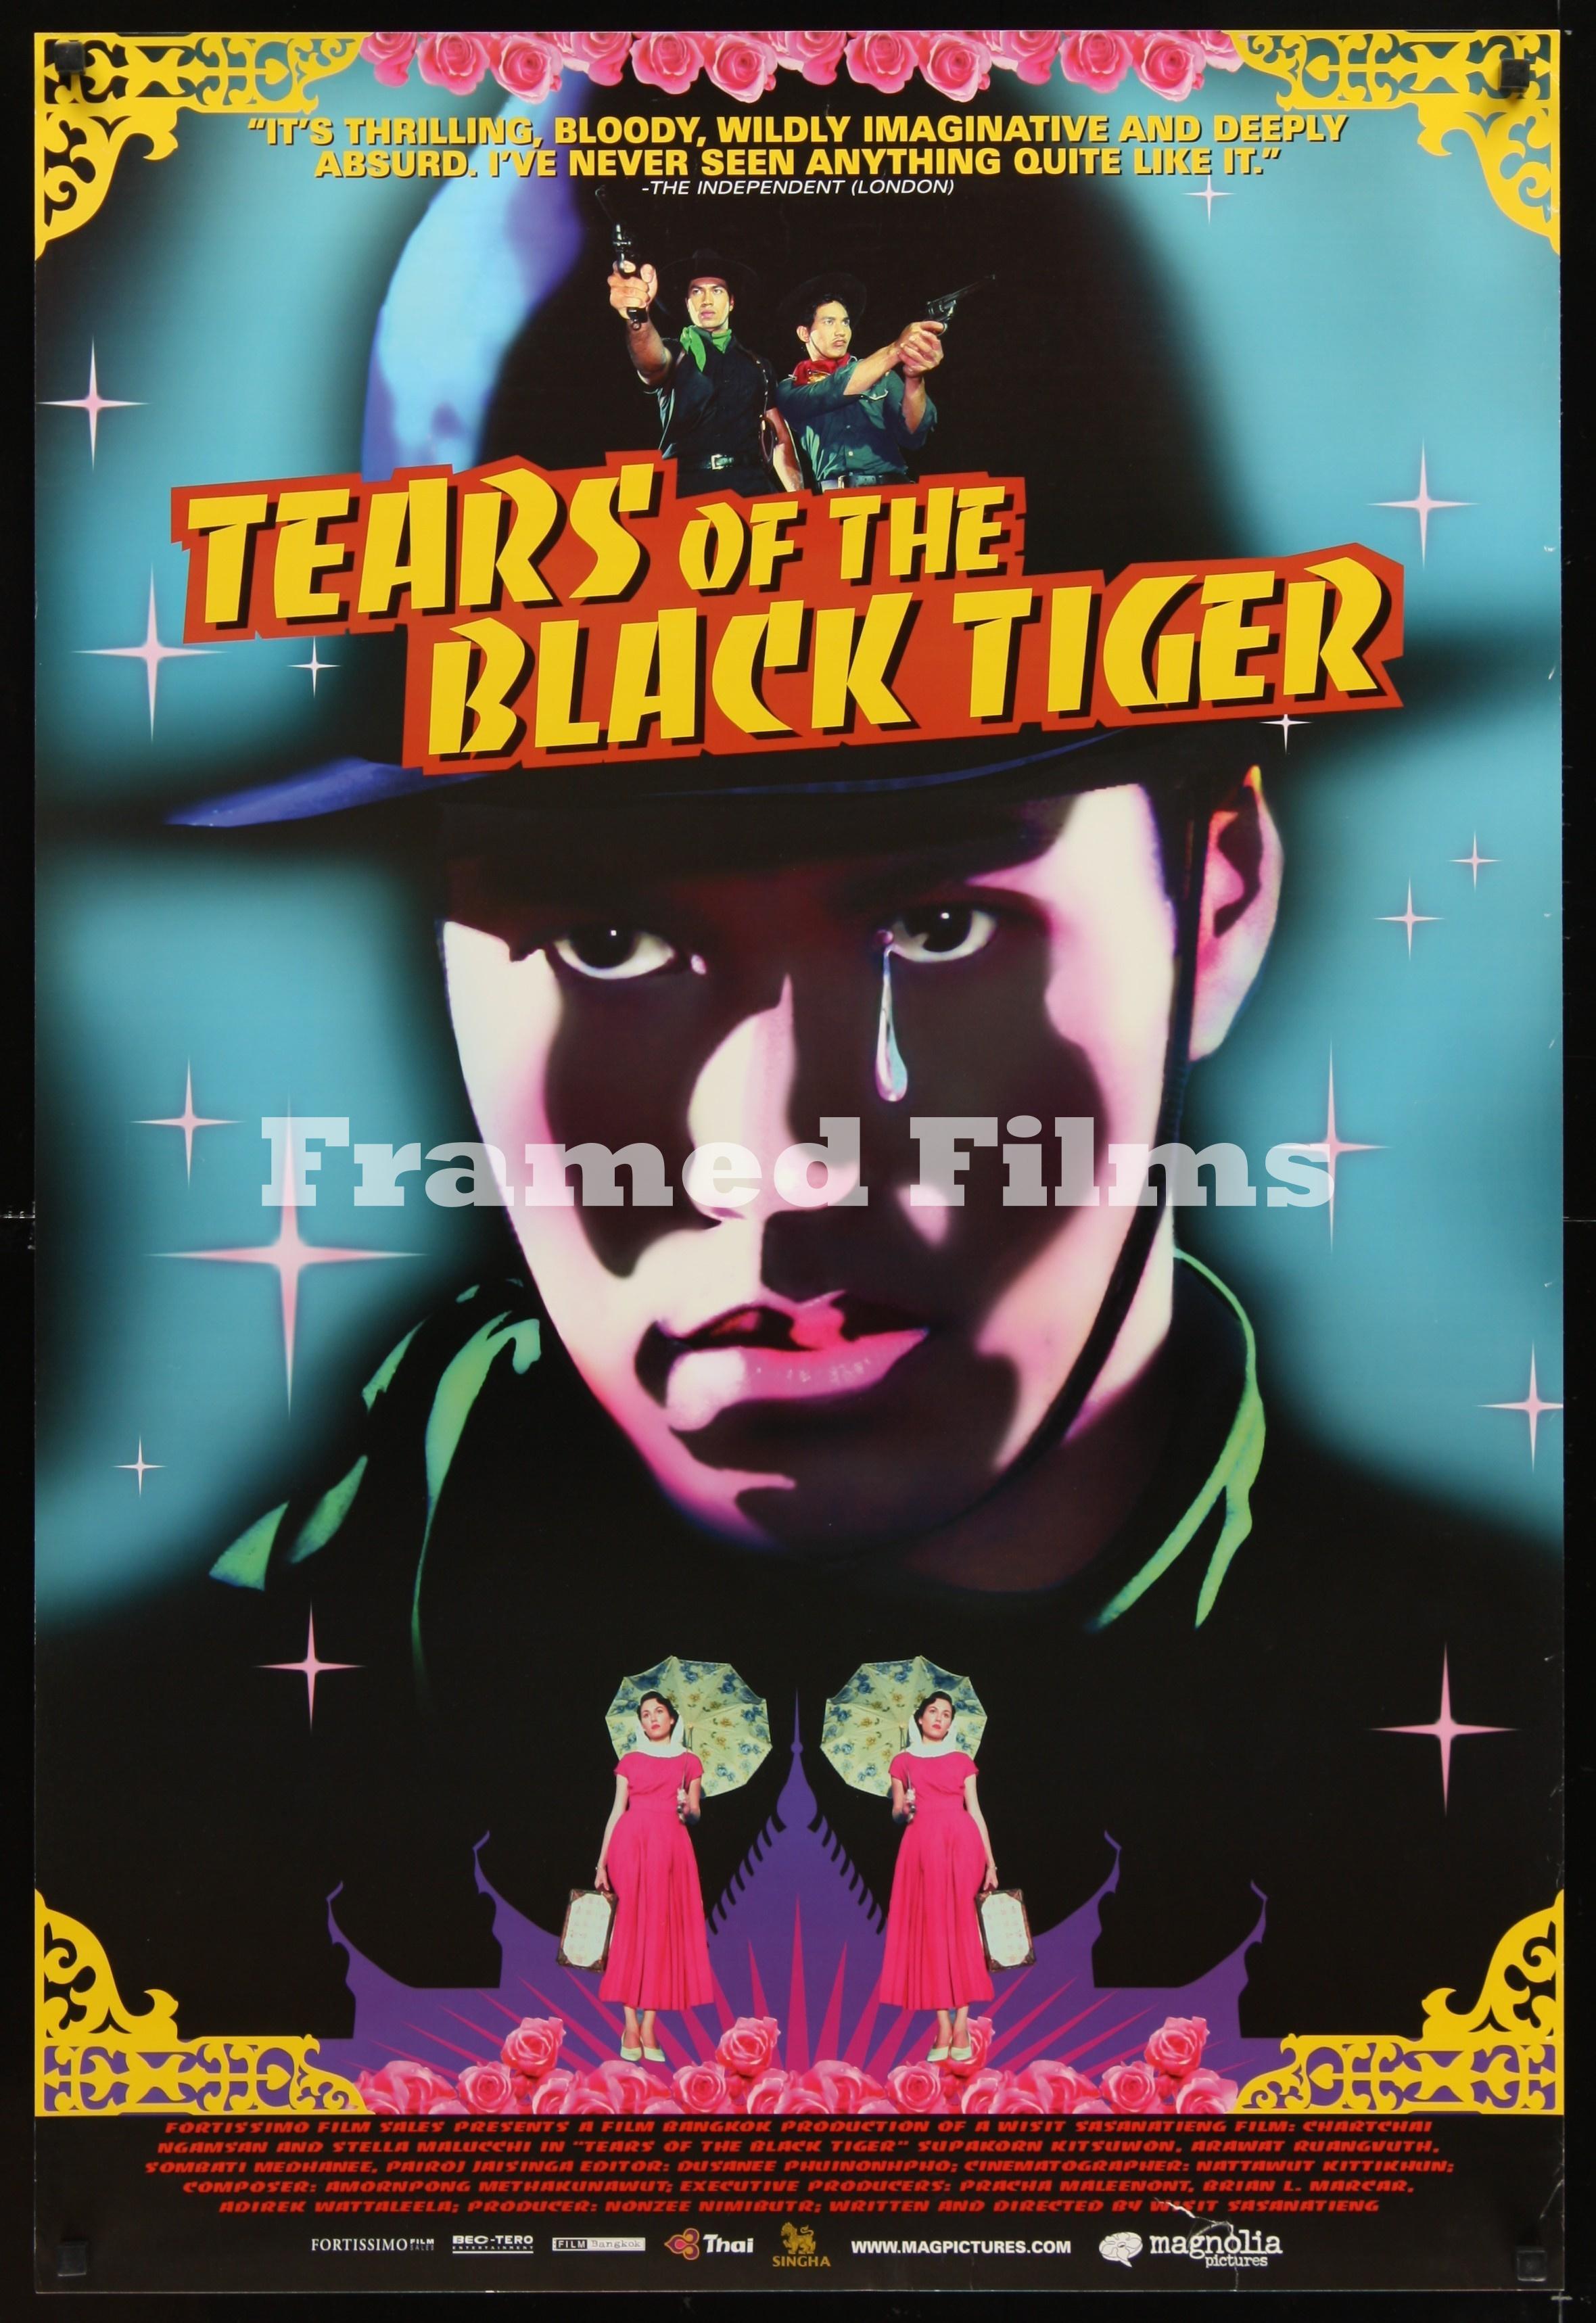 tears_of_the_black_tiger_HP00985_L.jpg